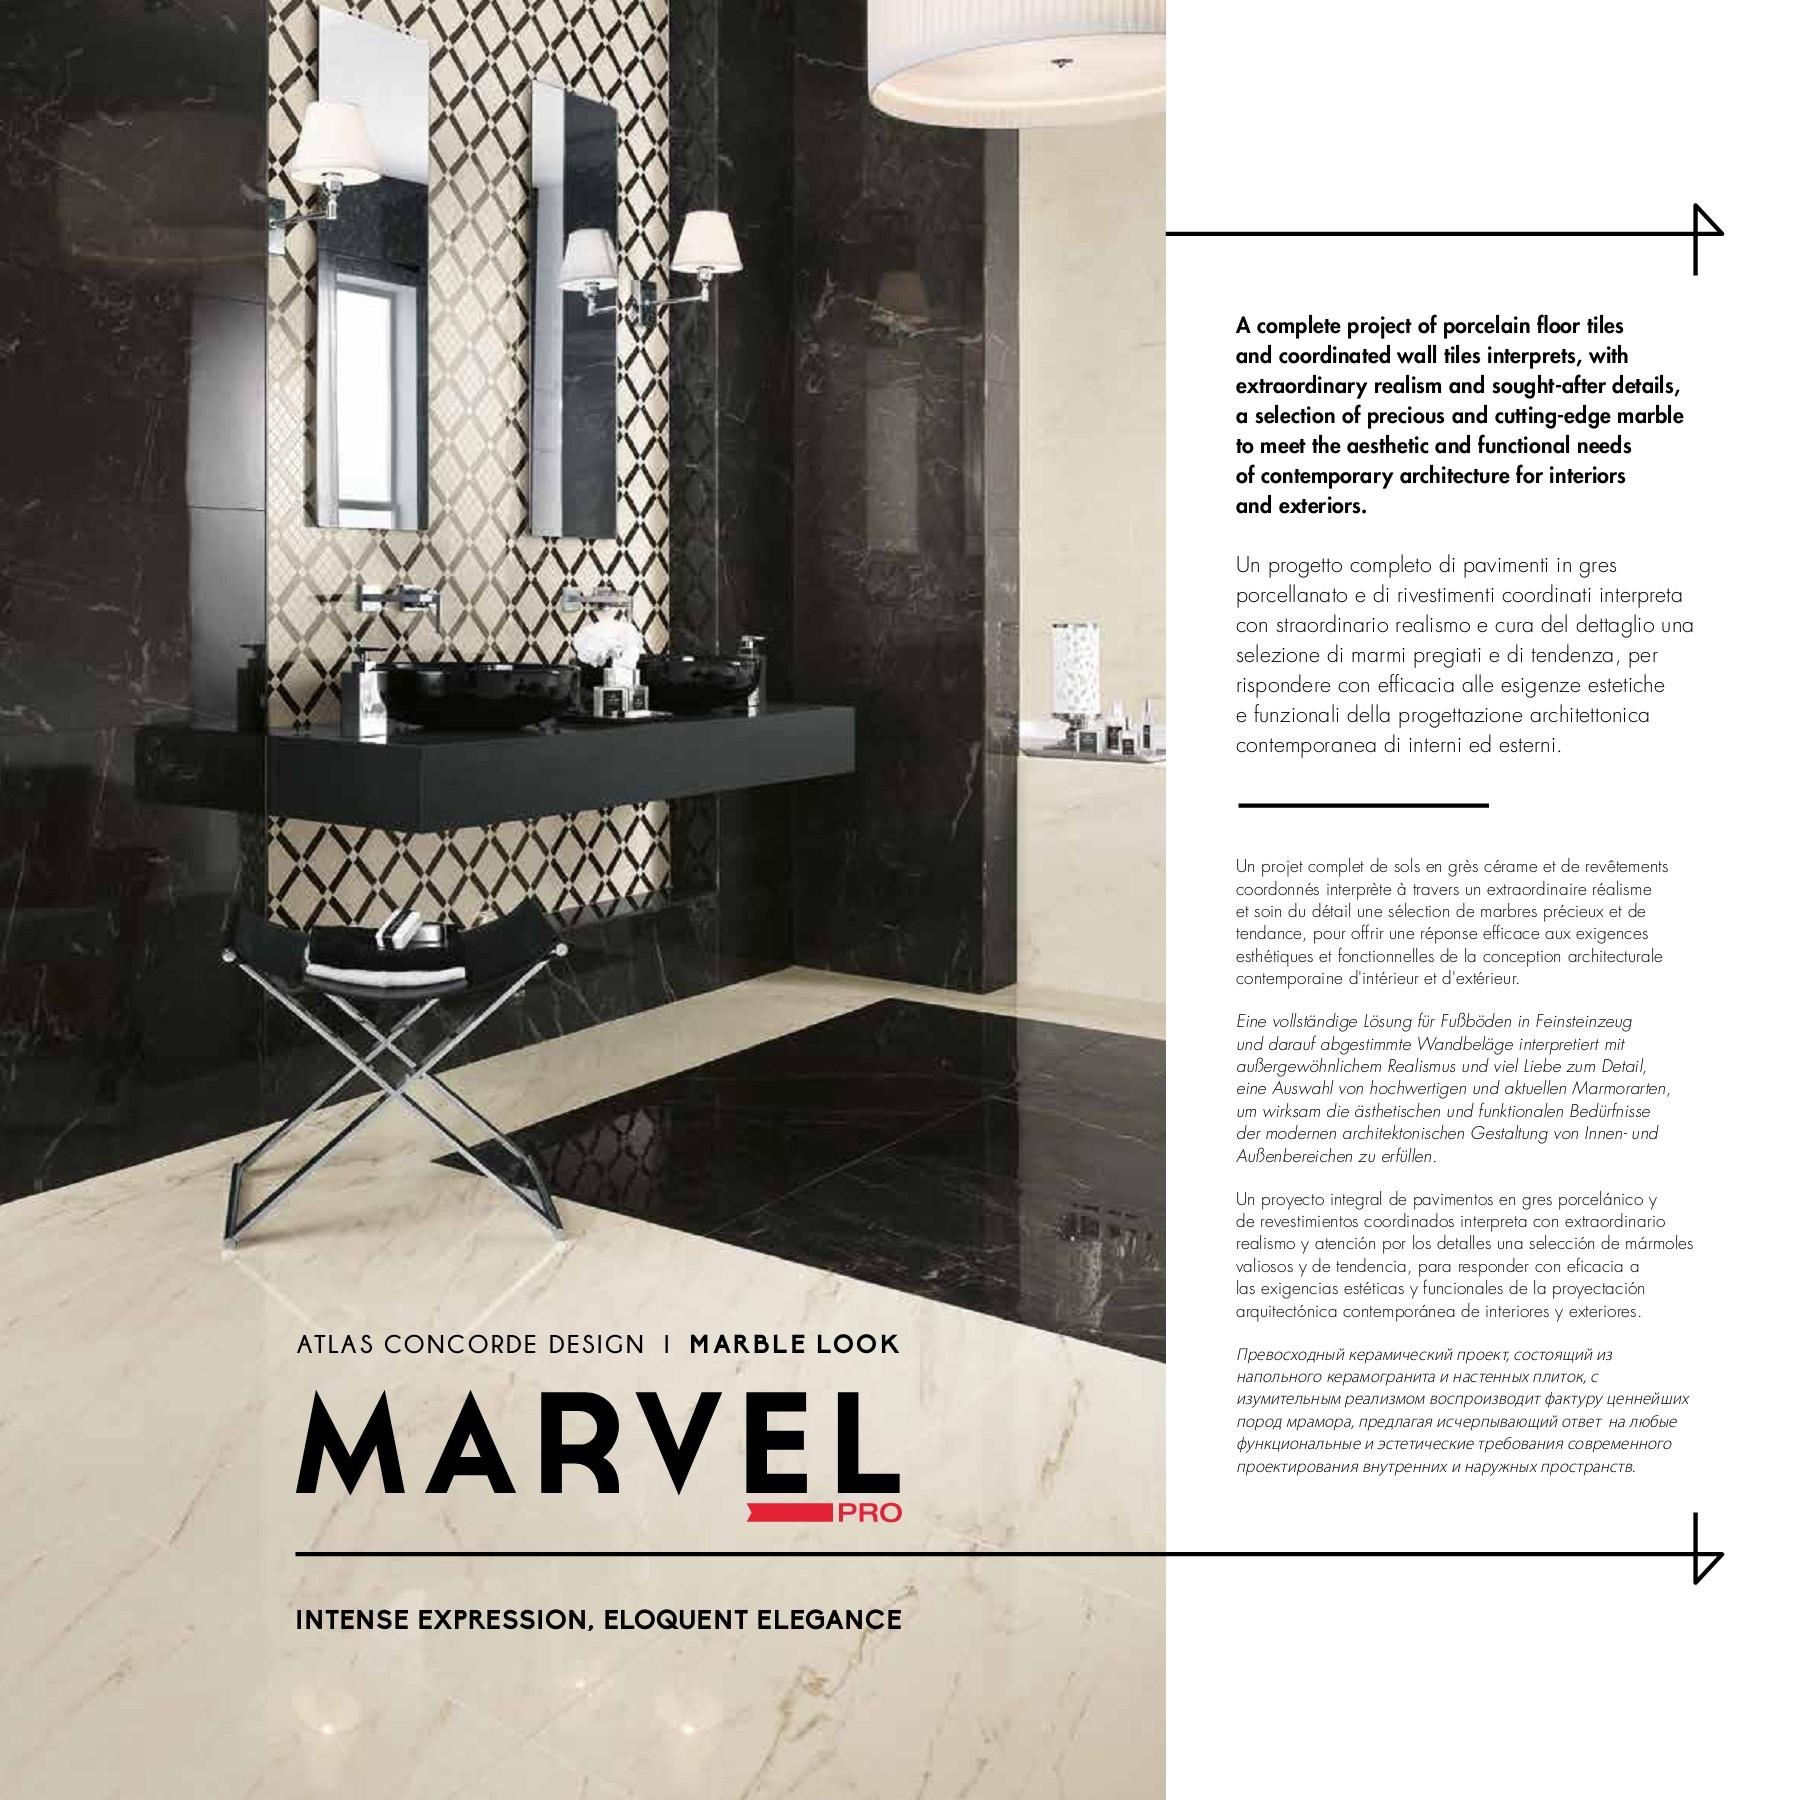 Rivestimenti Scale Interne Gres Porcellanato marvel pro floor design-flip book pages 1-50 | pubhtml5